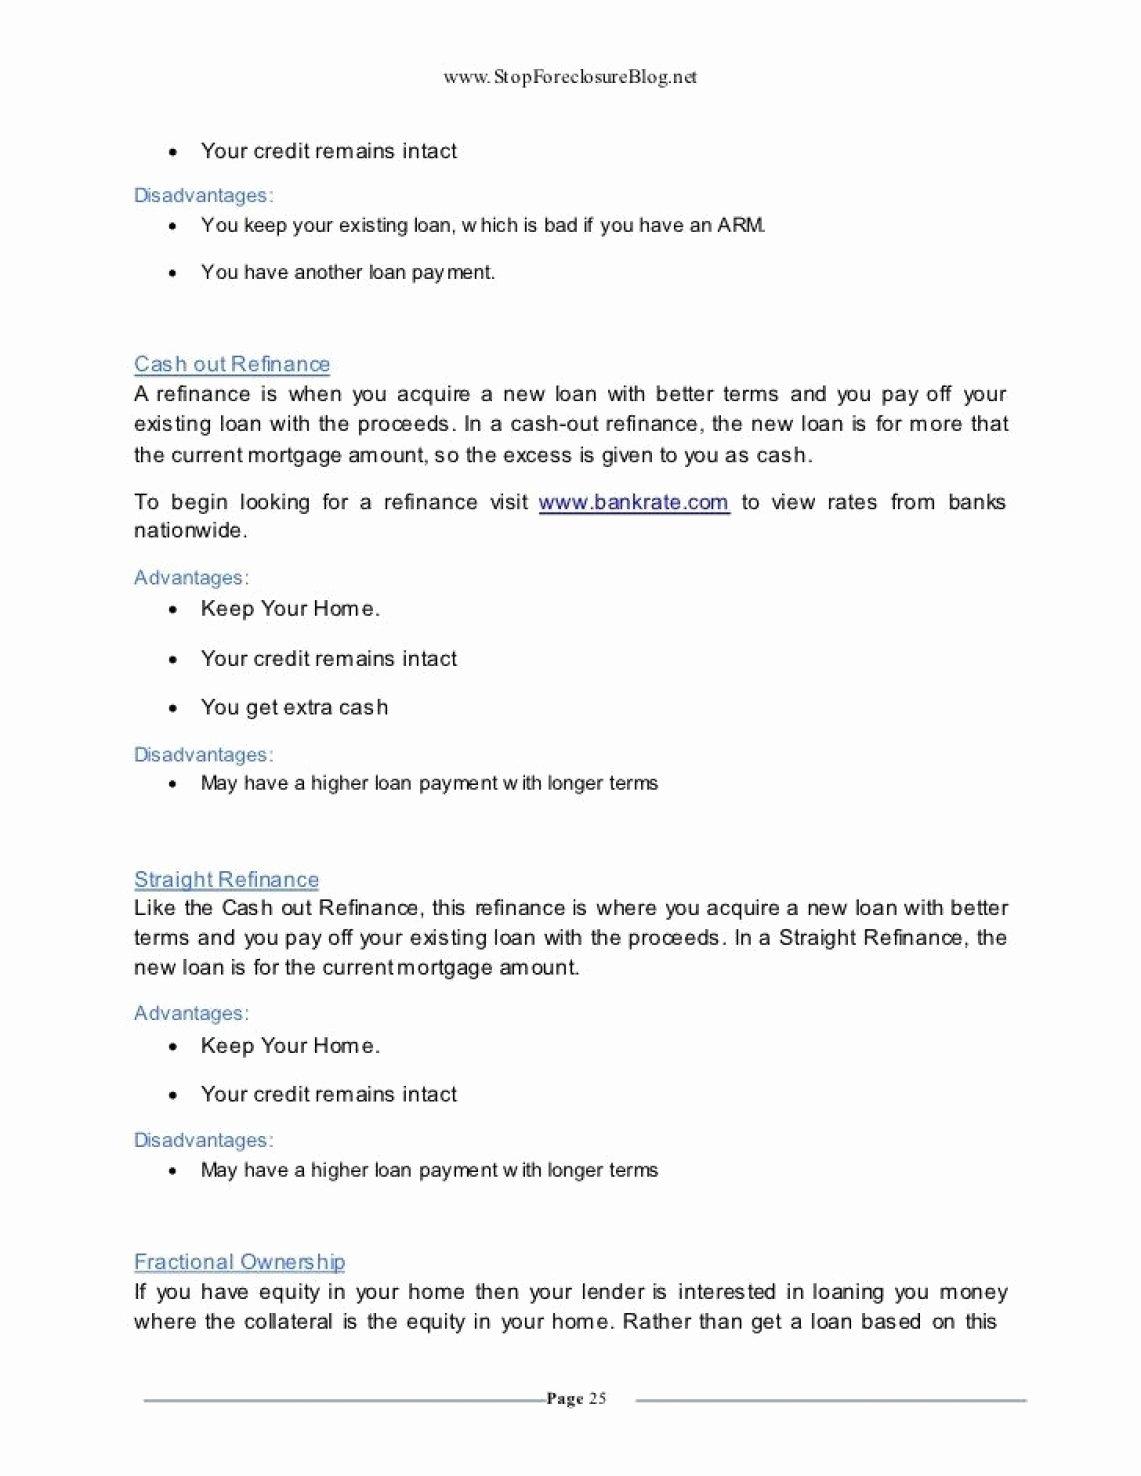 Explanation Letter Sample Lovely 10 Mortgage Letter Of Explanation Sample